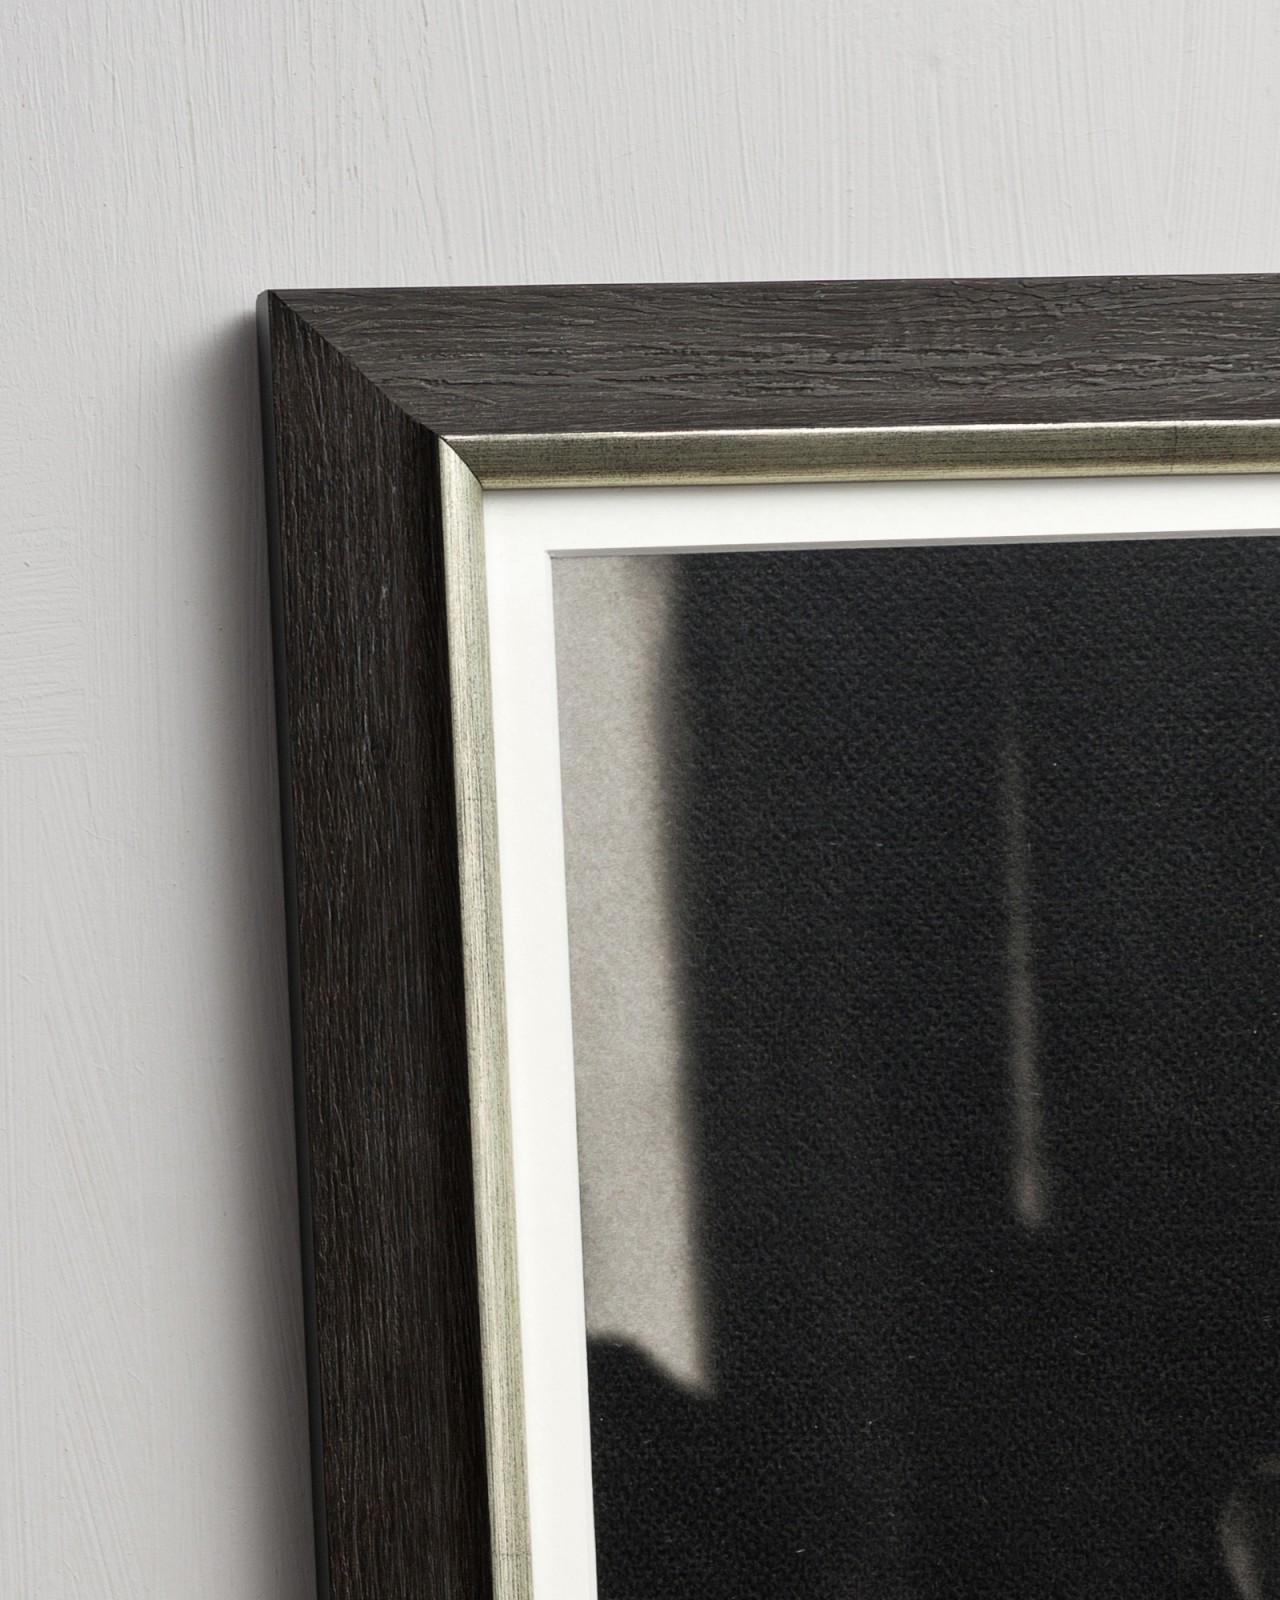 AMERICAN SKYSCRAPERS Set of 2 Framed art